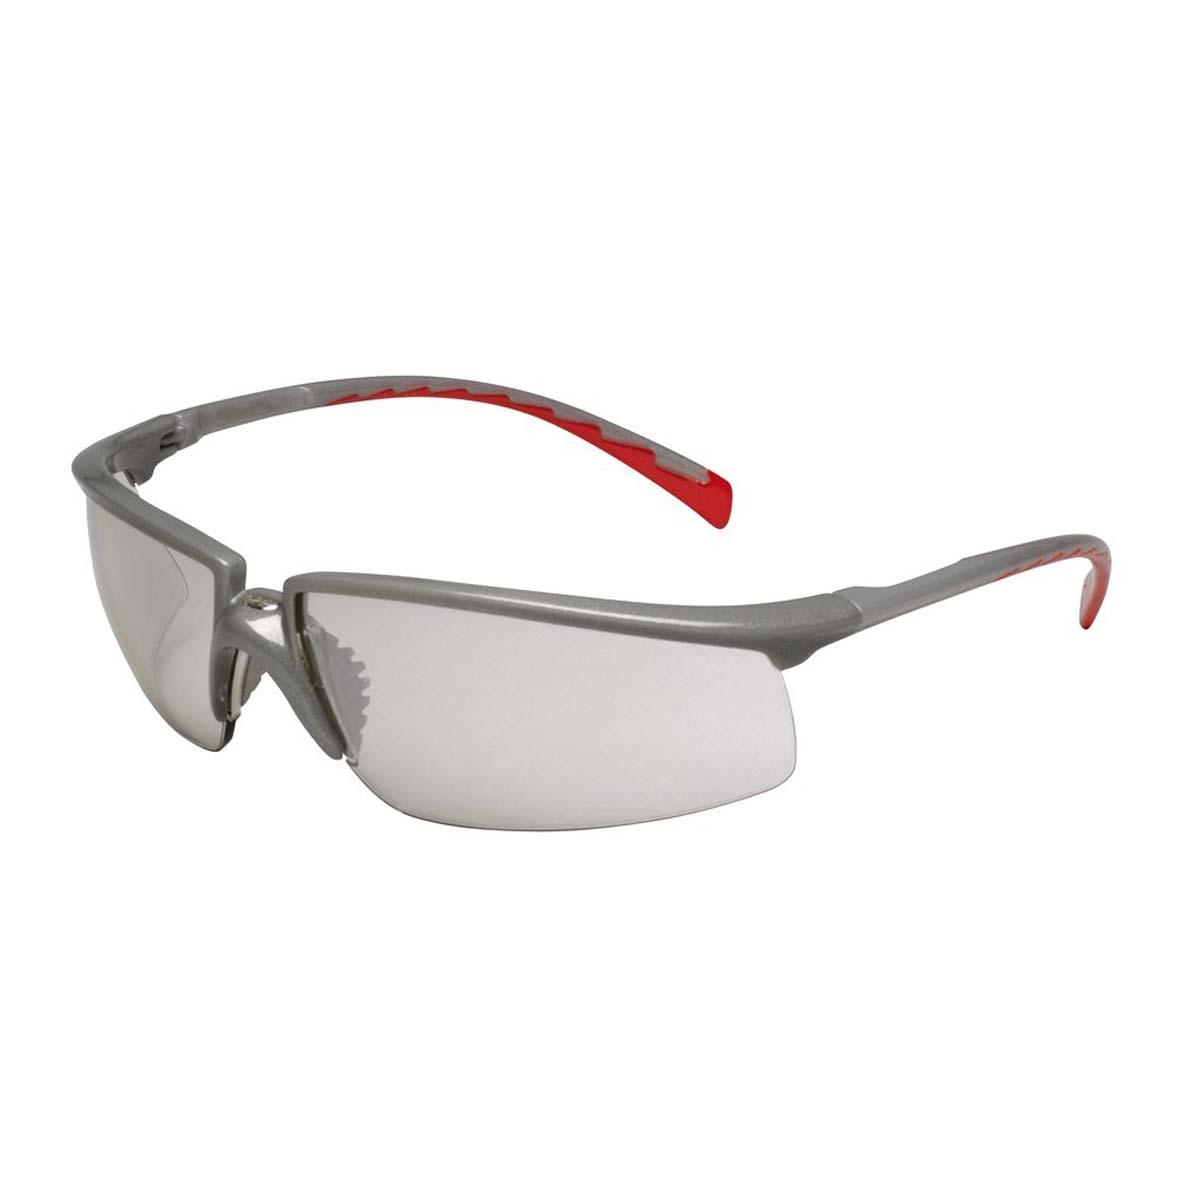 "3Mâ""¢ Privoâ""¢ Protective Eyewear 12268-00000-20 I/O Mirror Lens, Silver Frame"